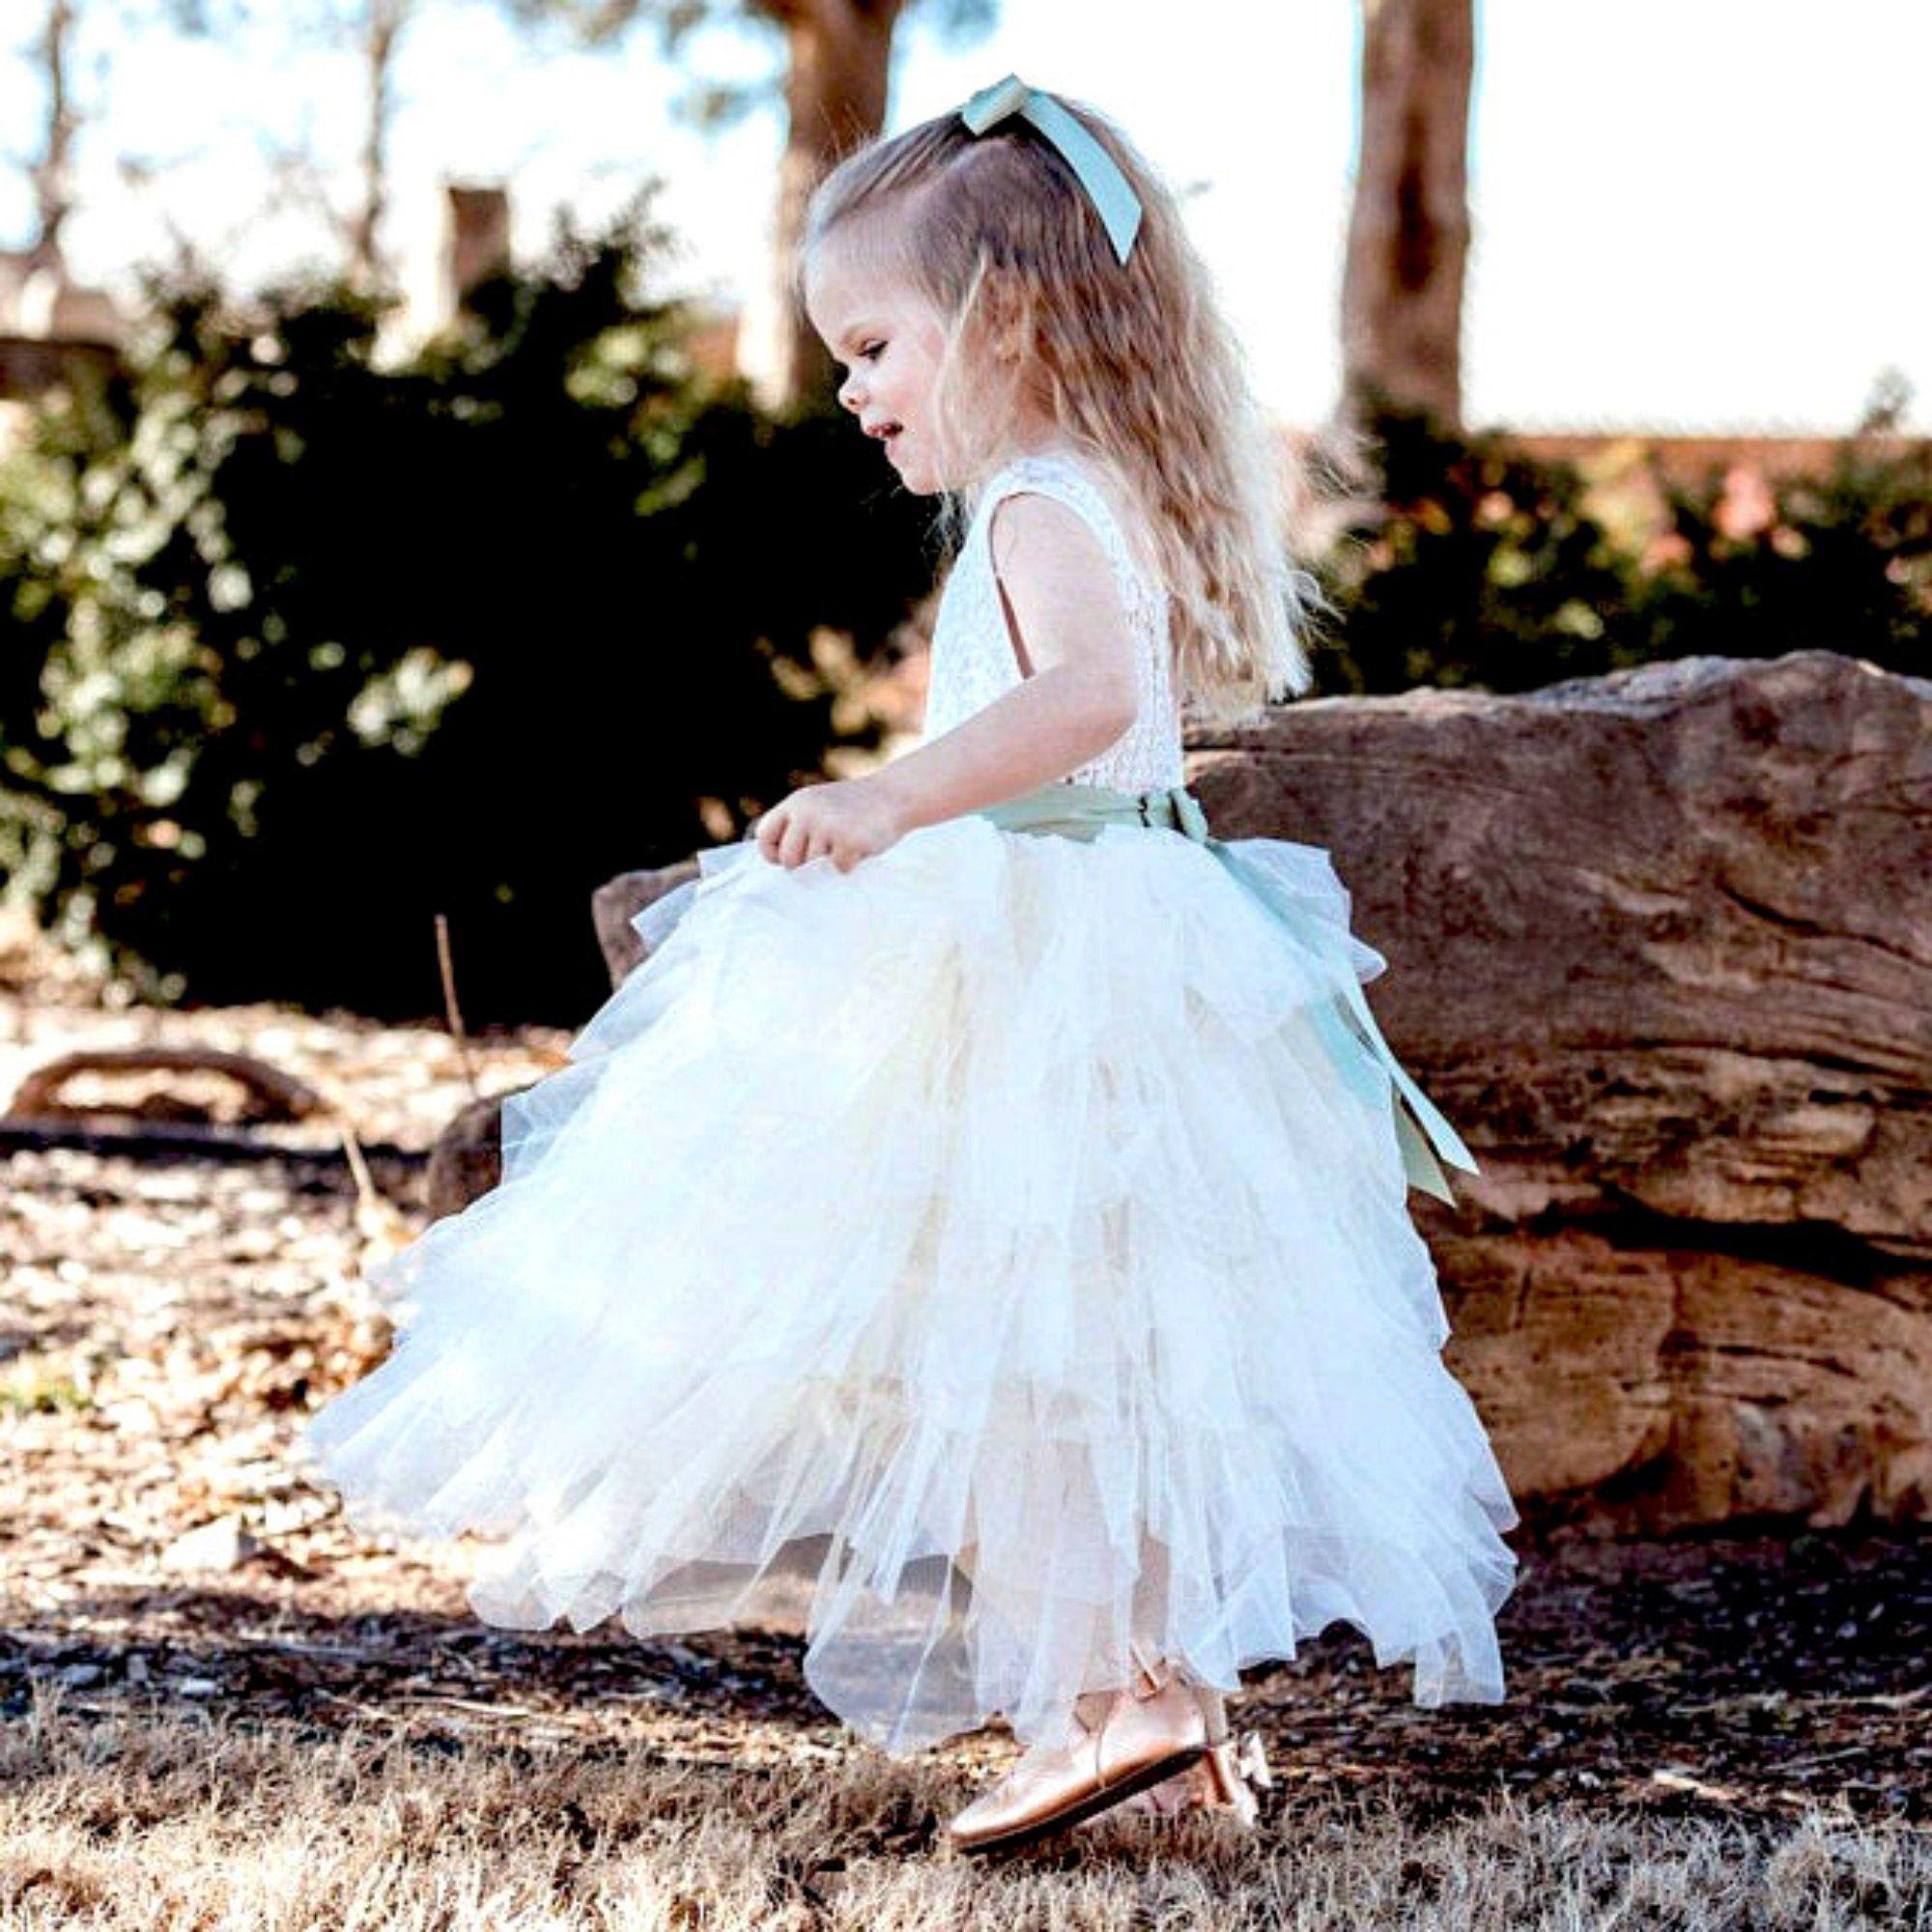 Tulle flower girl dress Rustic lace flower girl dresses Ivory flower girl dress Toddler dress Special Occasion Girls dress Birthday dress